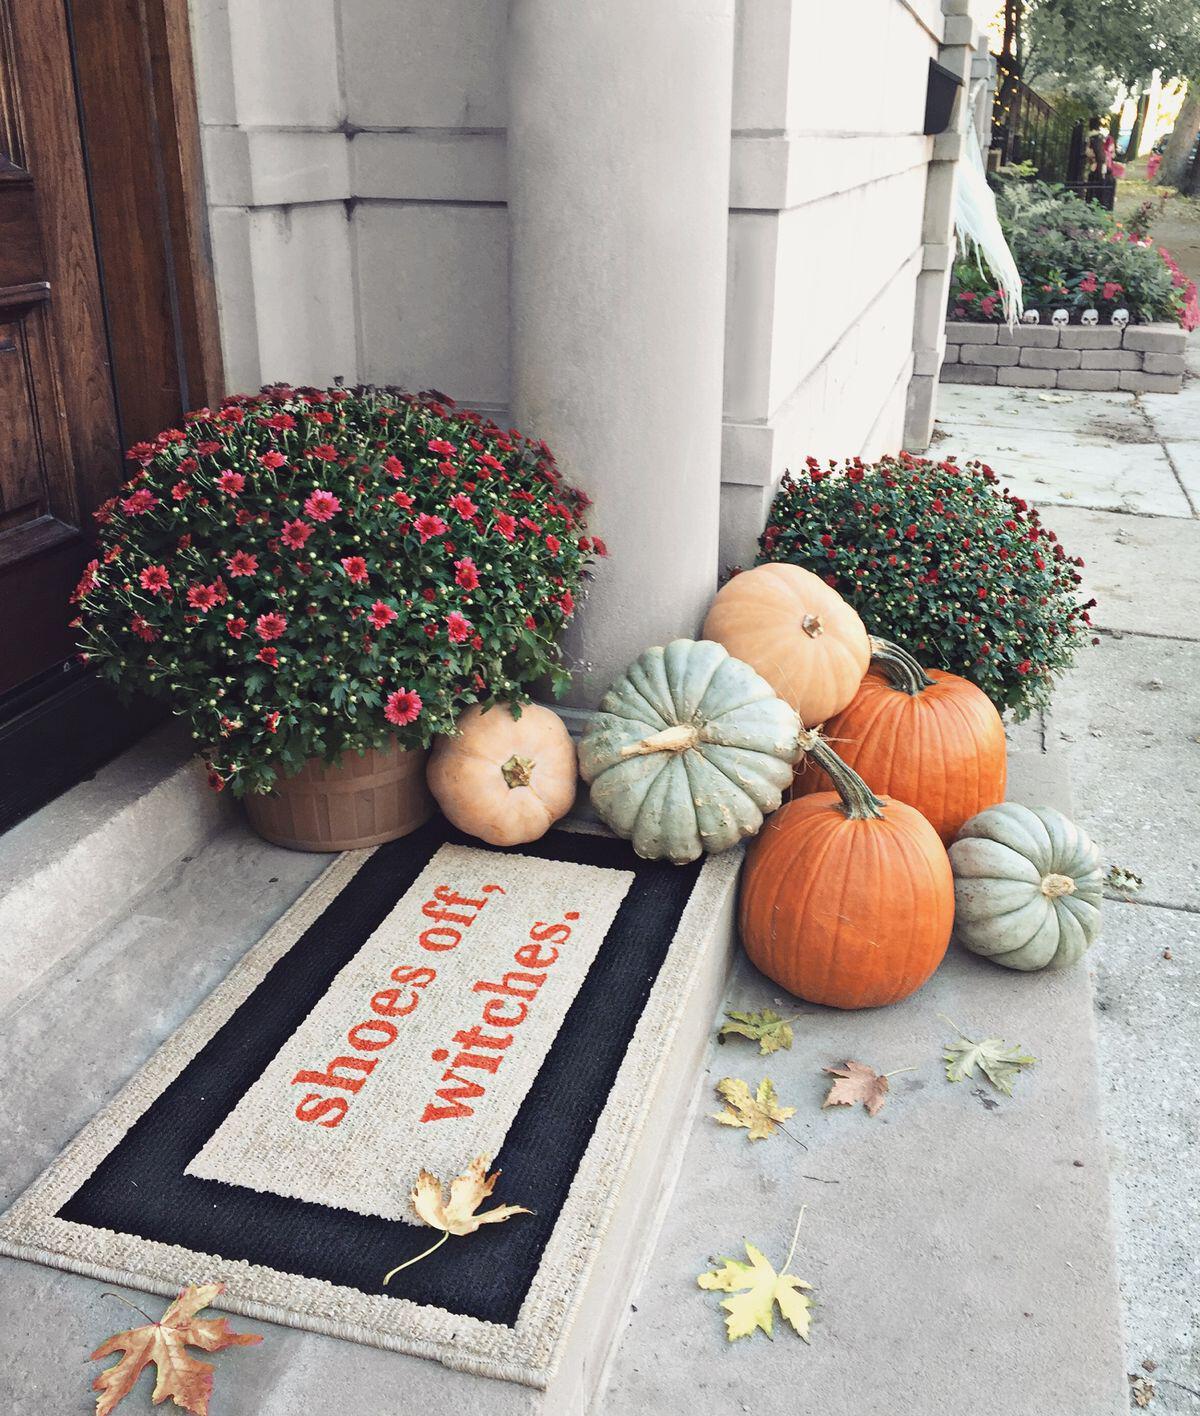 14 amazing fall porch decorating ideas 6 - 14 amazing fall porch decorating ideas